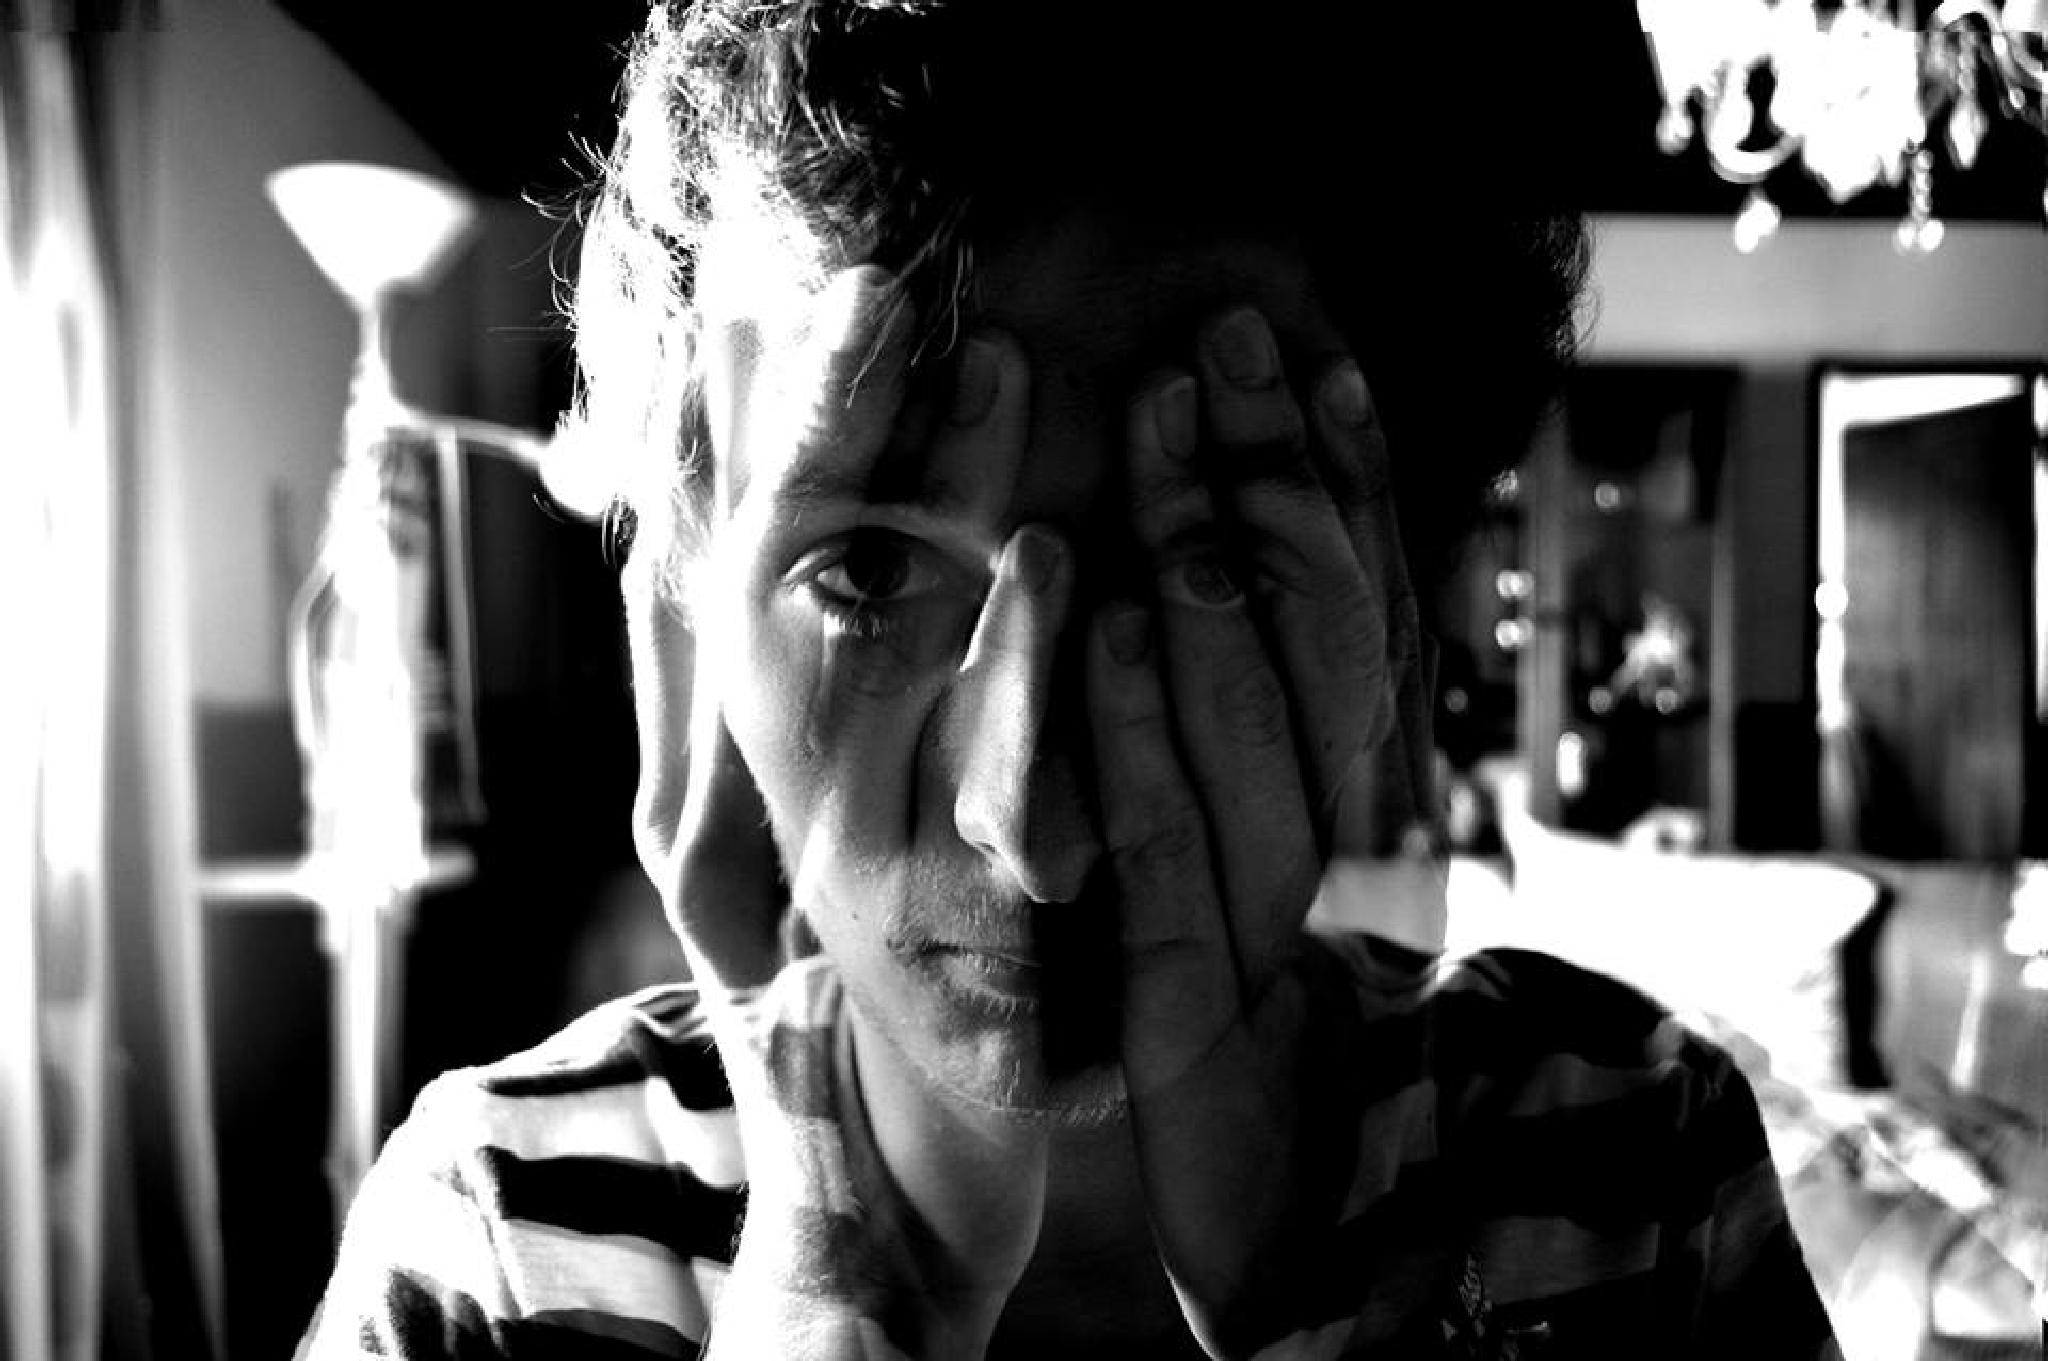 """Blind"" by João of Suburbia"